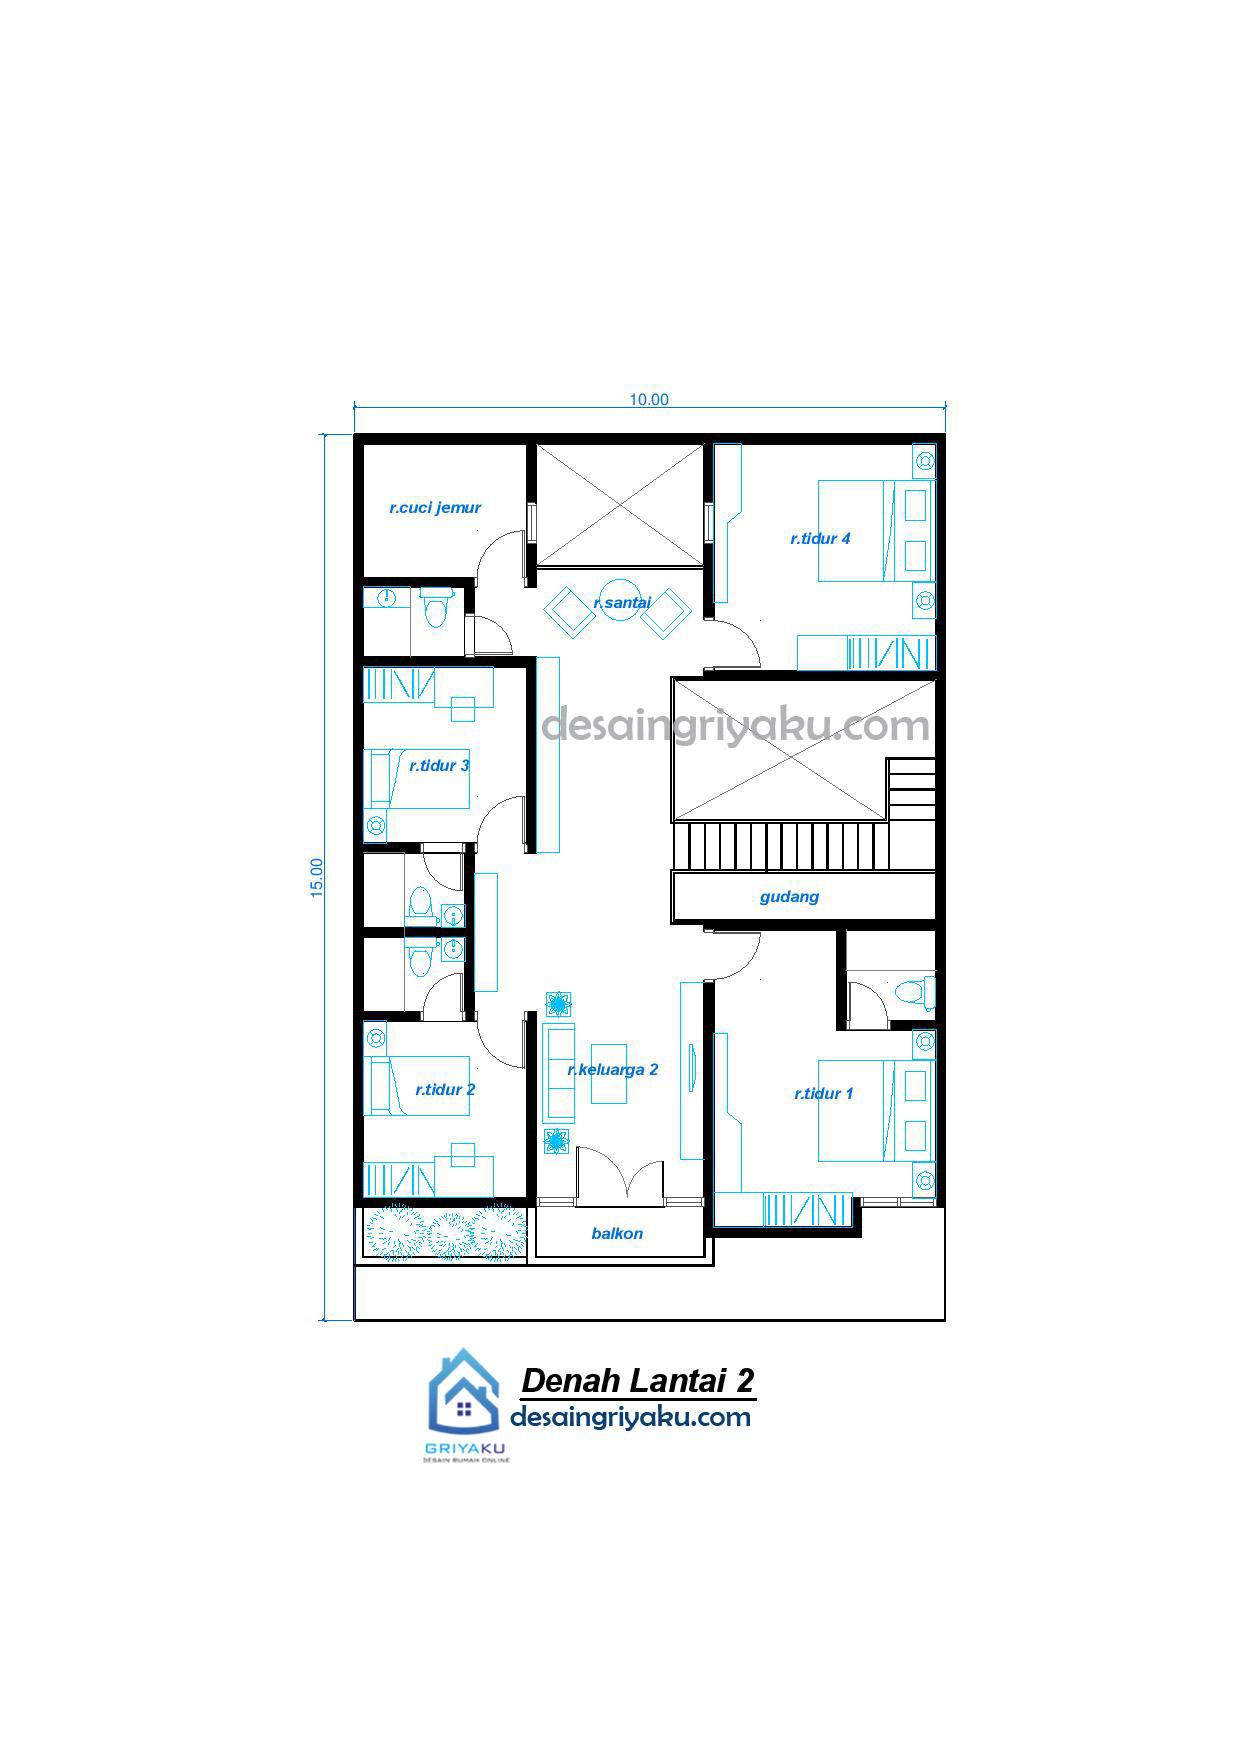 denah lt2 Rumah 10x15 Minimalis 2 lantai